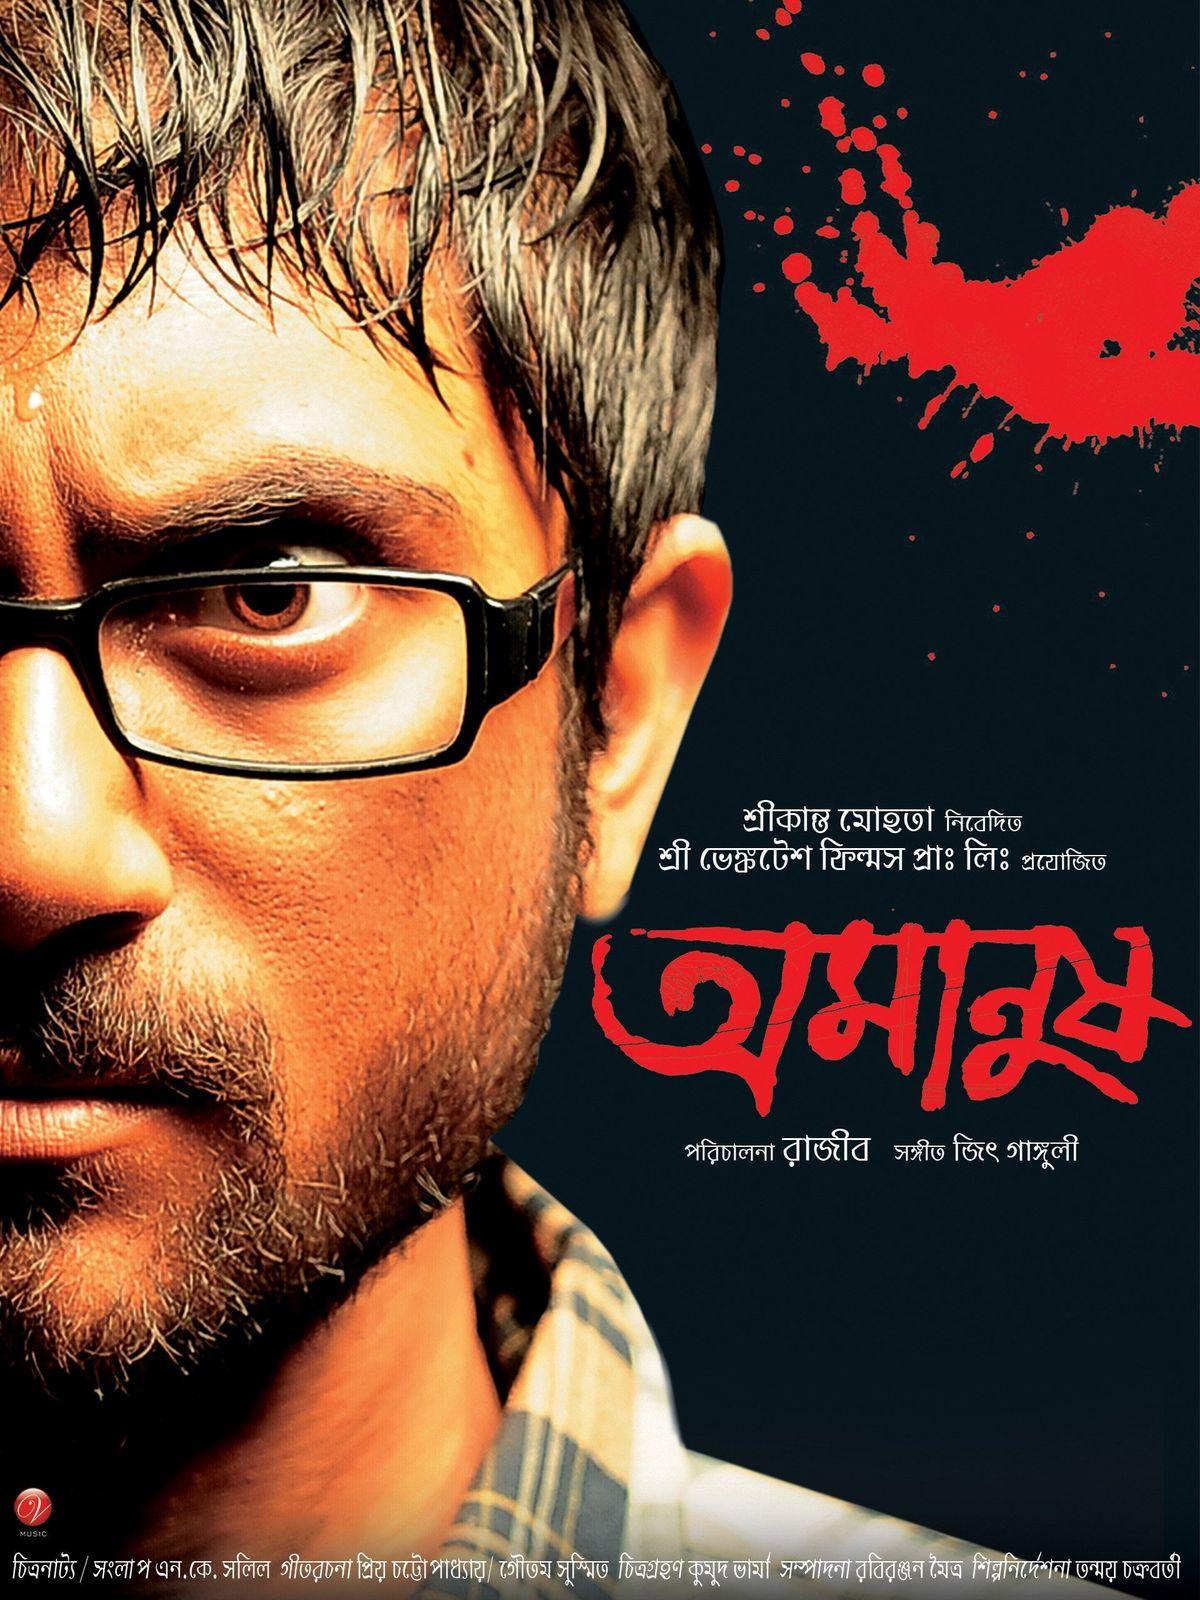 Rajib Biswas Best Movies, TV Shows and Web Series List